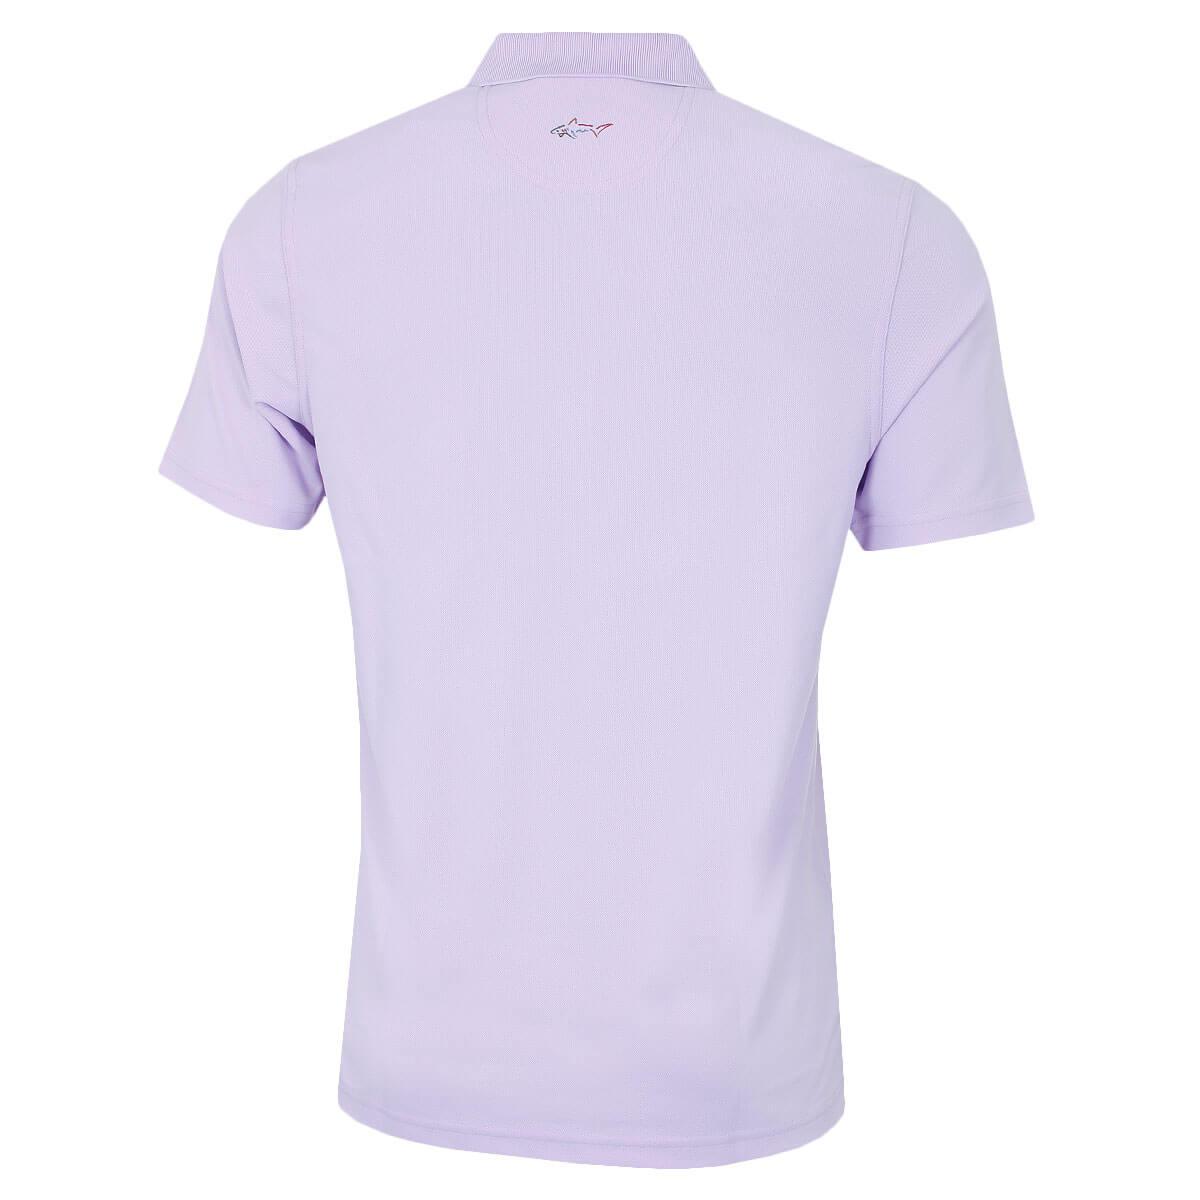 Greg-Norman-Mens-KX04-Performance-Micro-Pique-Golf-Polo-Shirt-28-OFF-RRP thumbnail 74